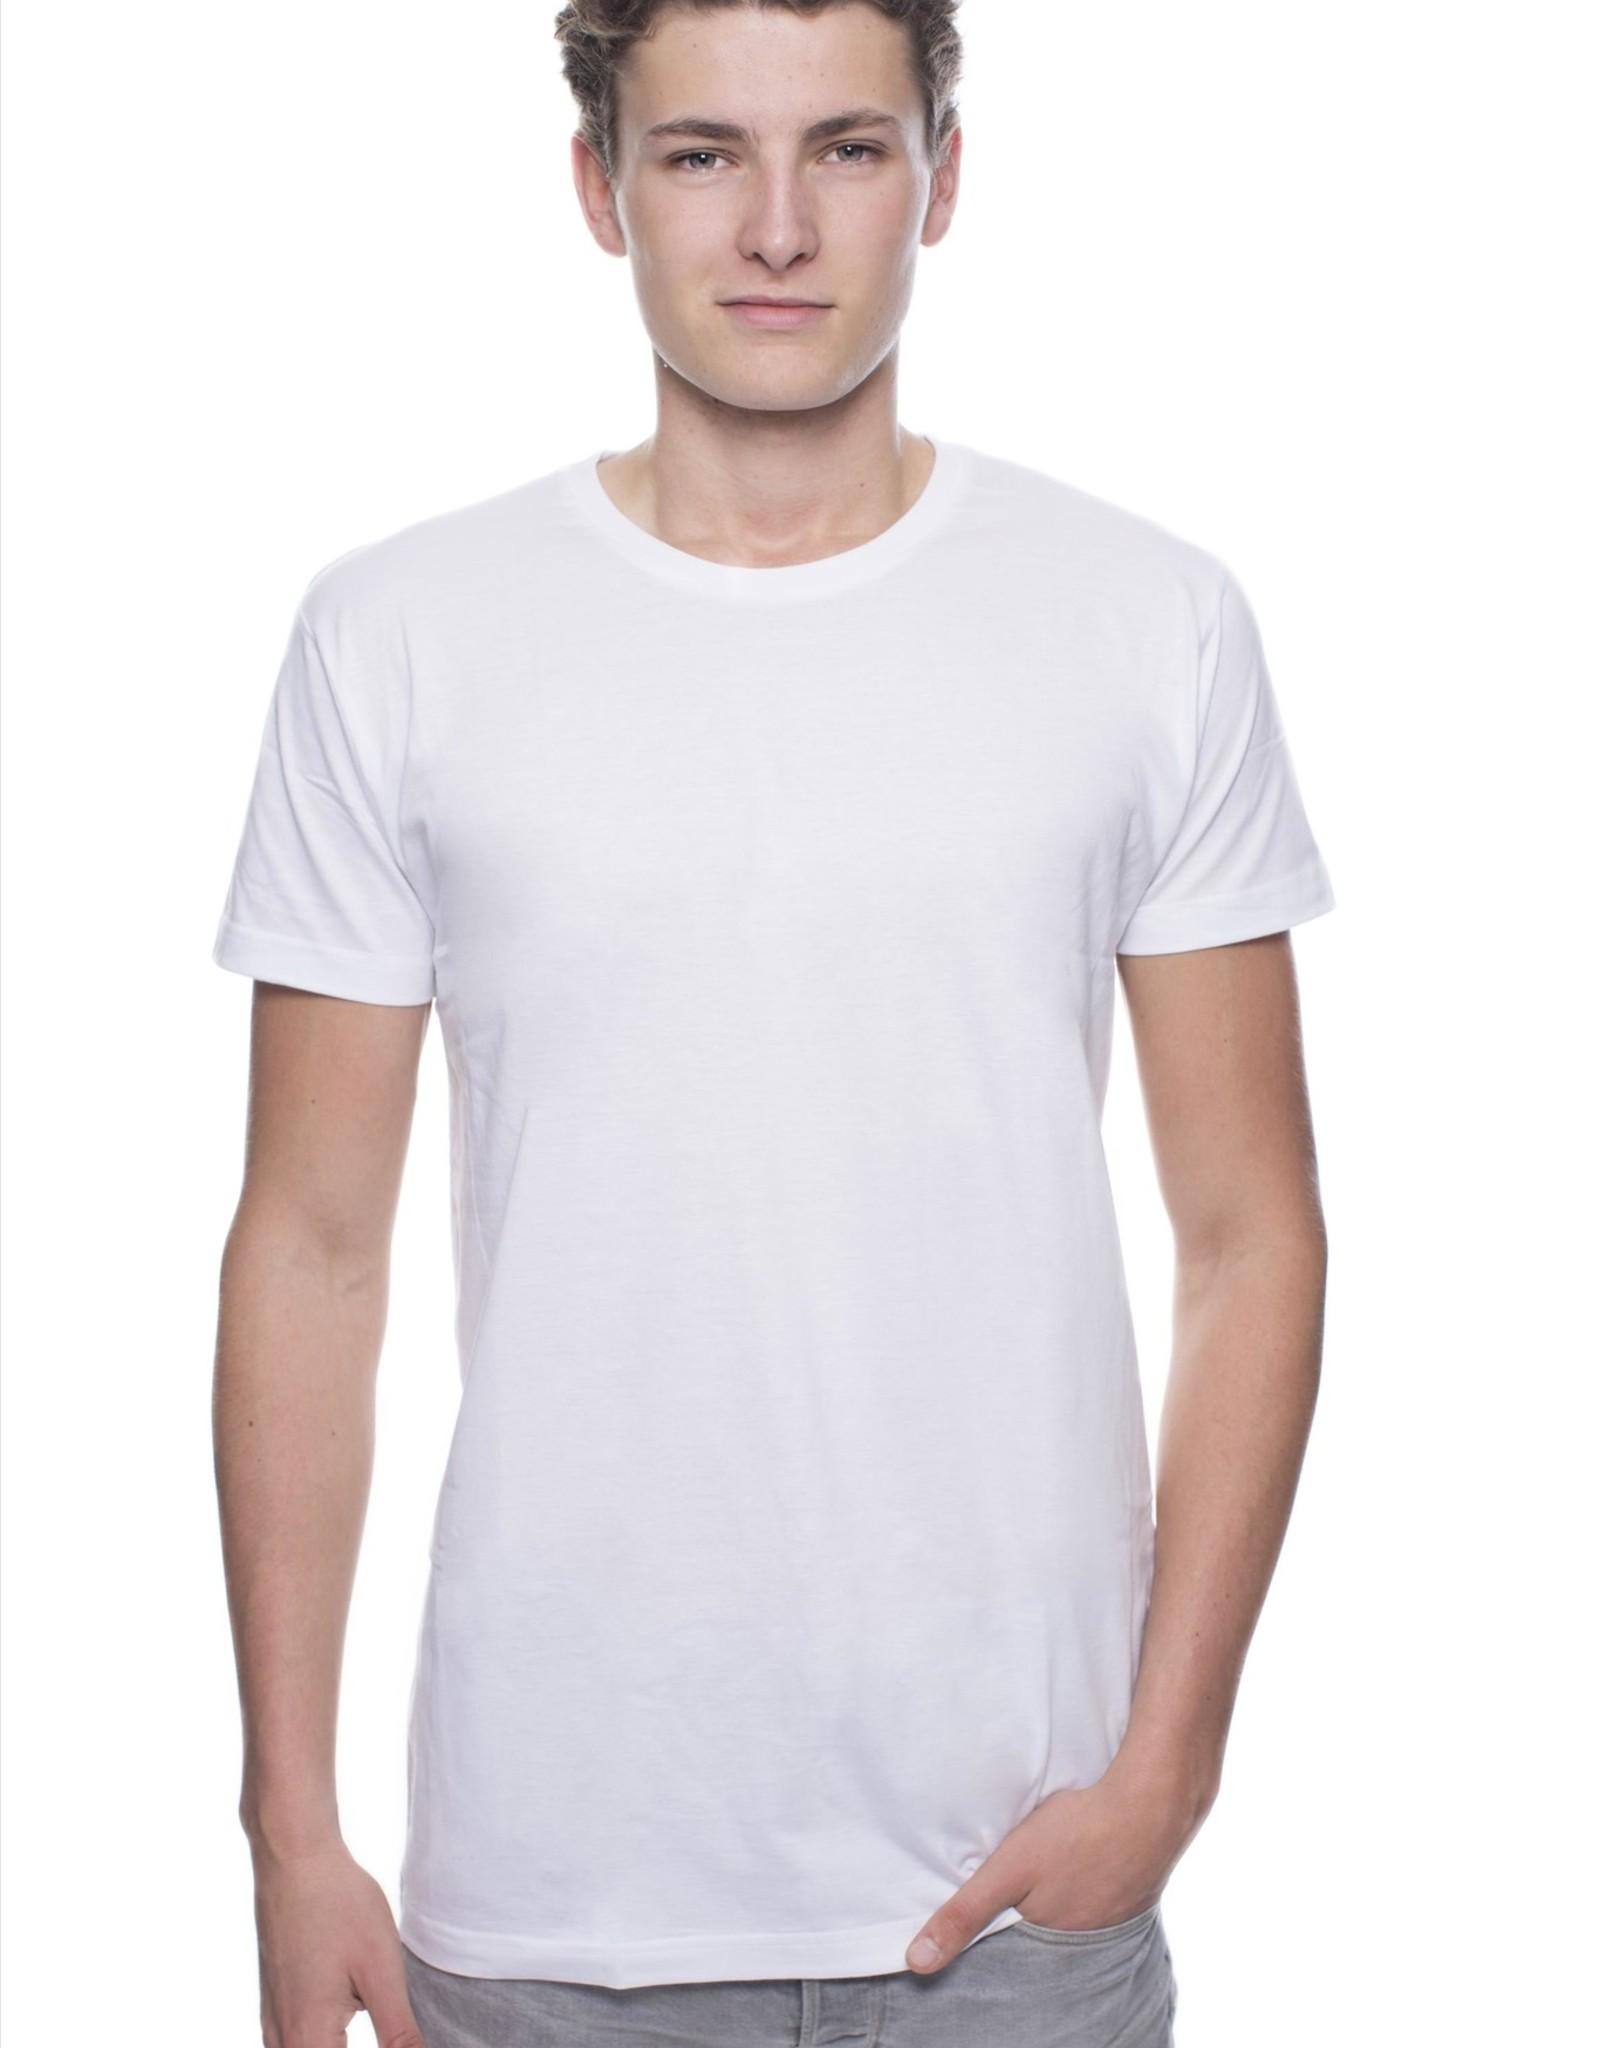 Logostar T-SHIRT basic extra lang zwart